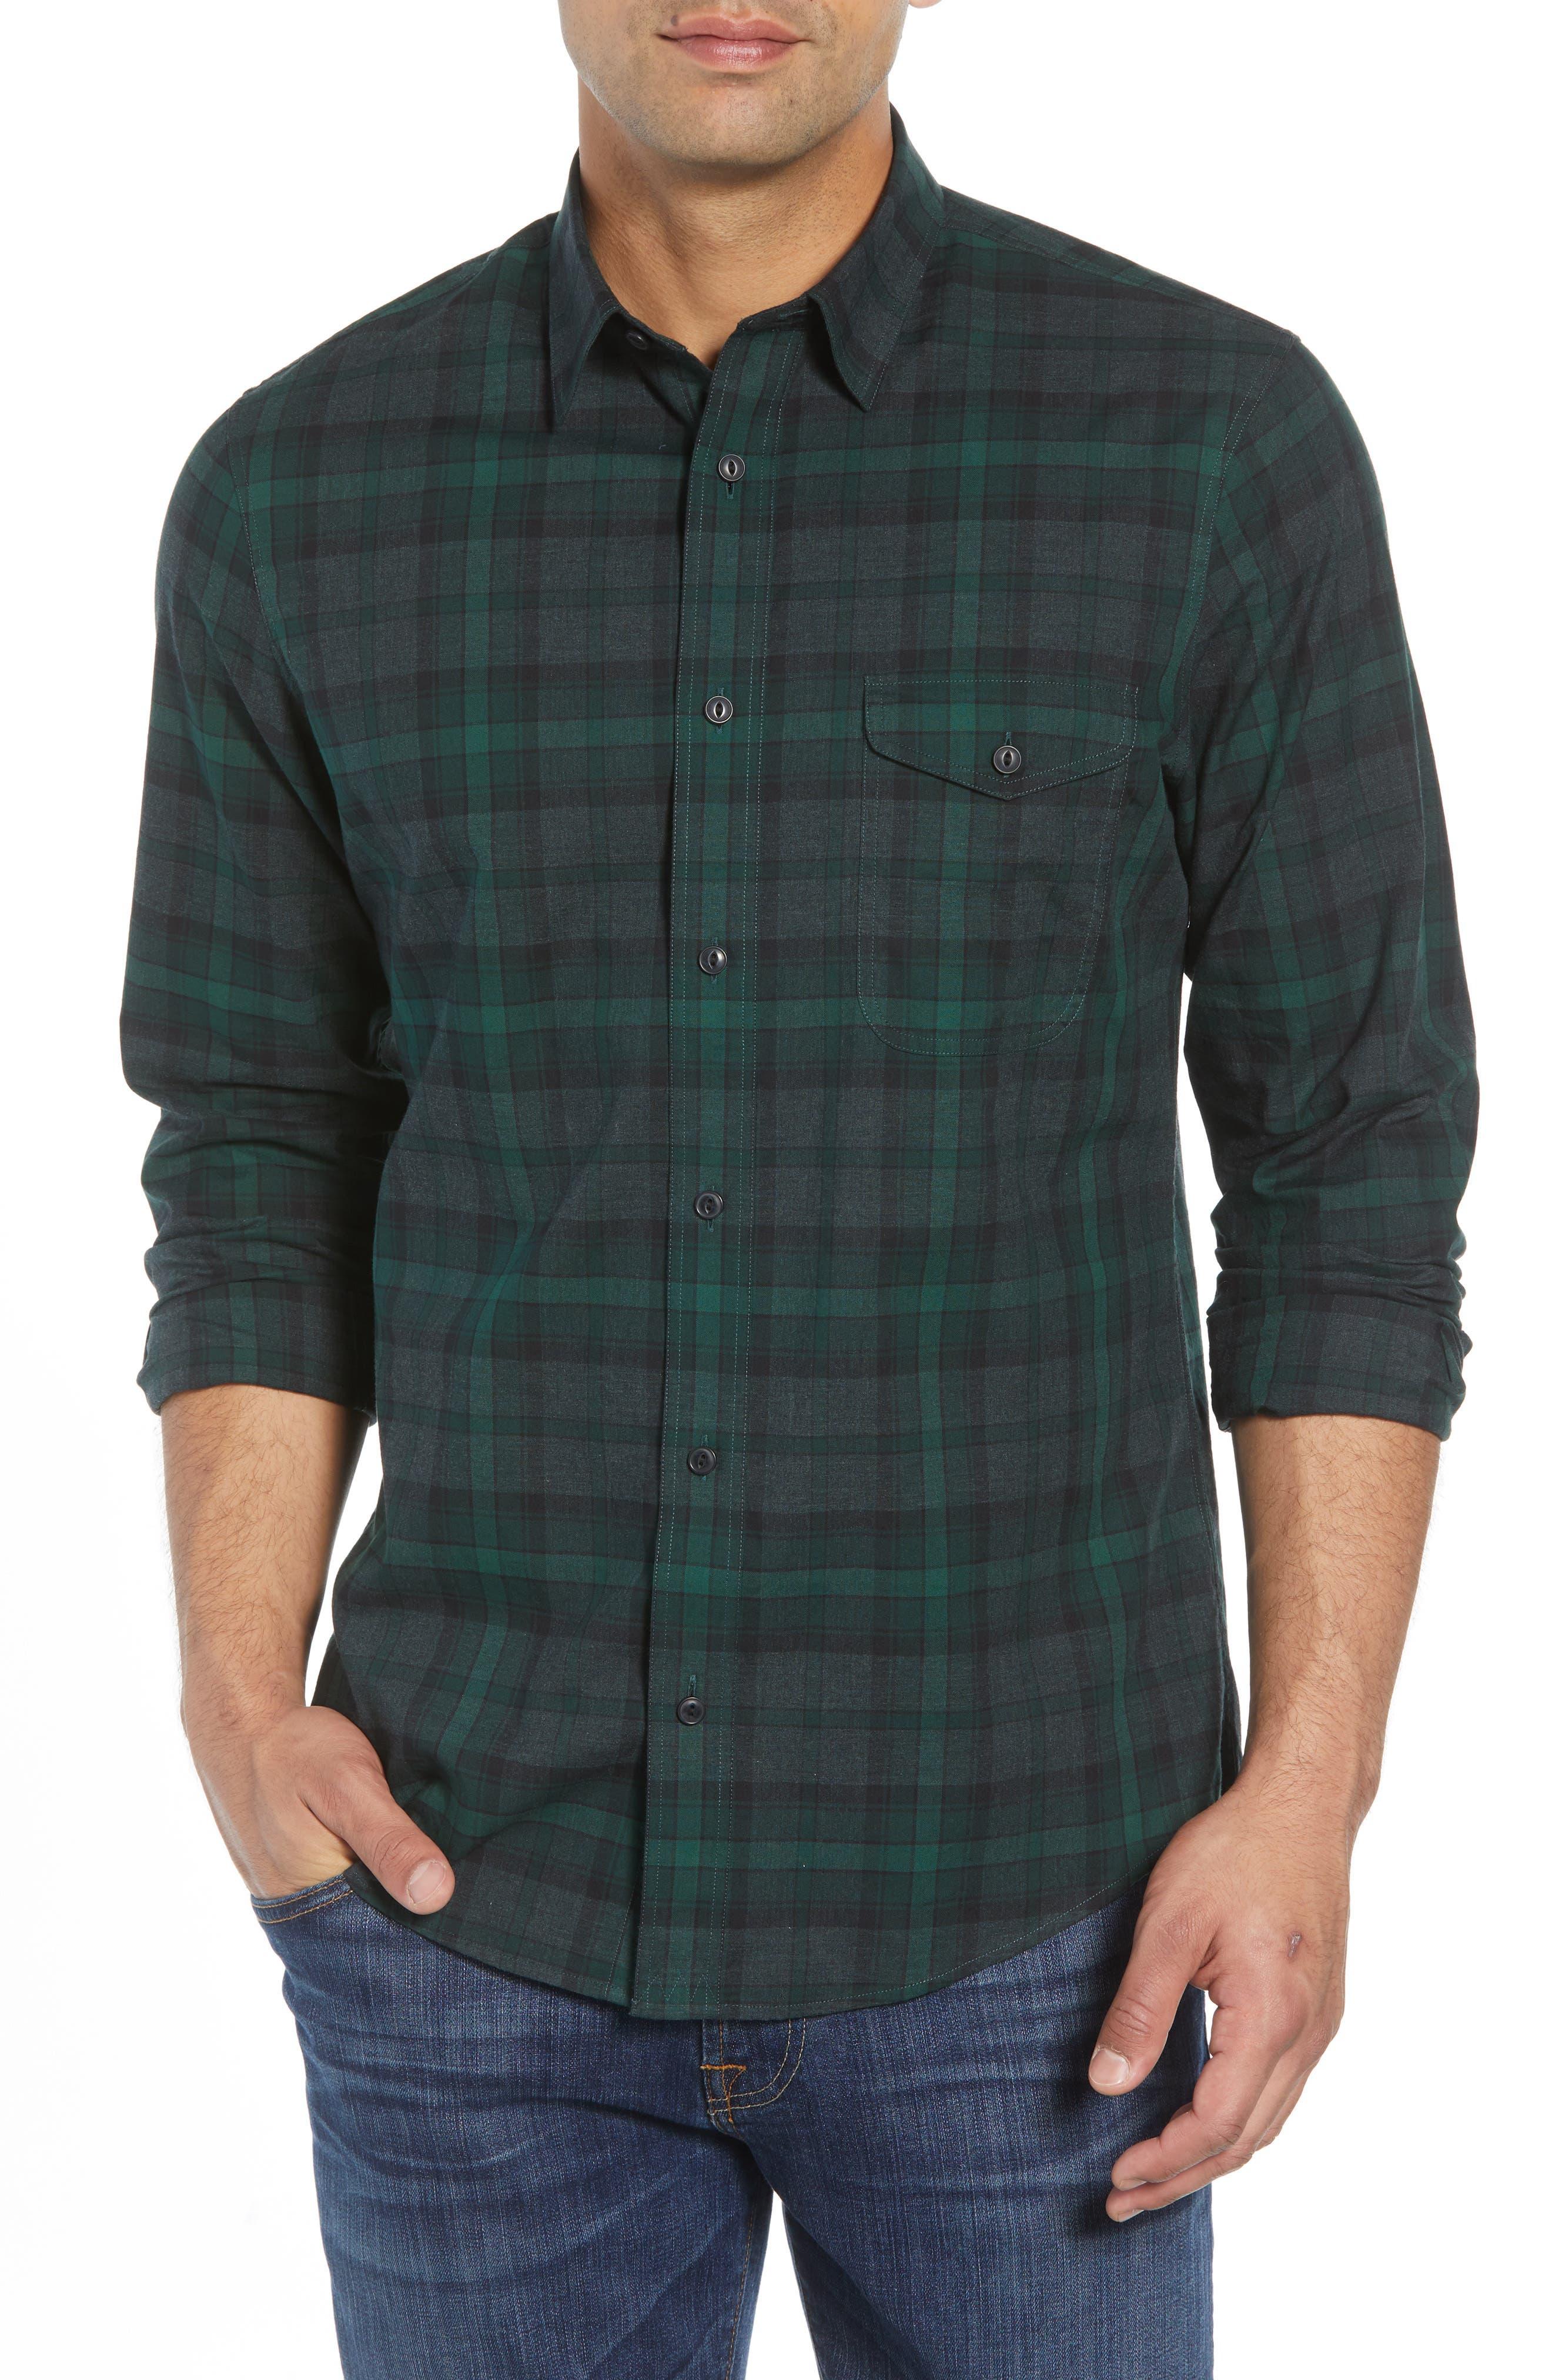 Regular Fit Plaid Flannel Sport Shirt,                         Main,                         color, GREEN FOREST GREY PLAID